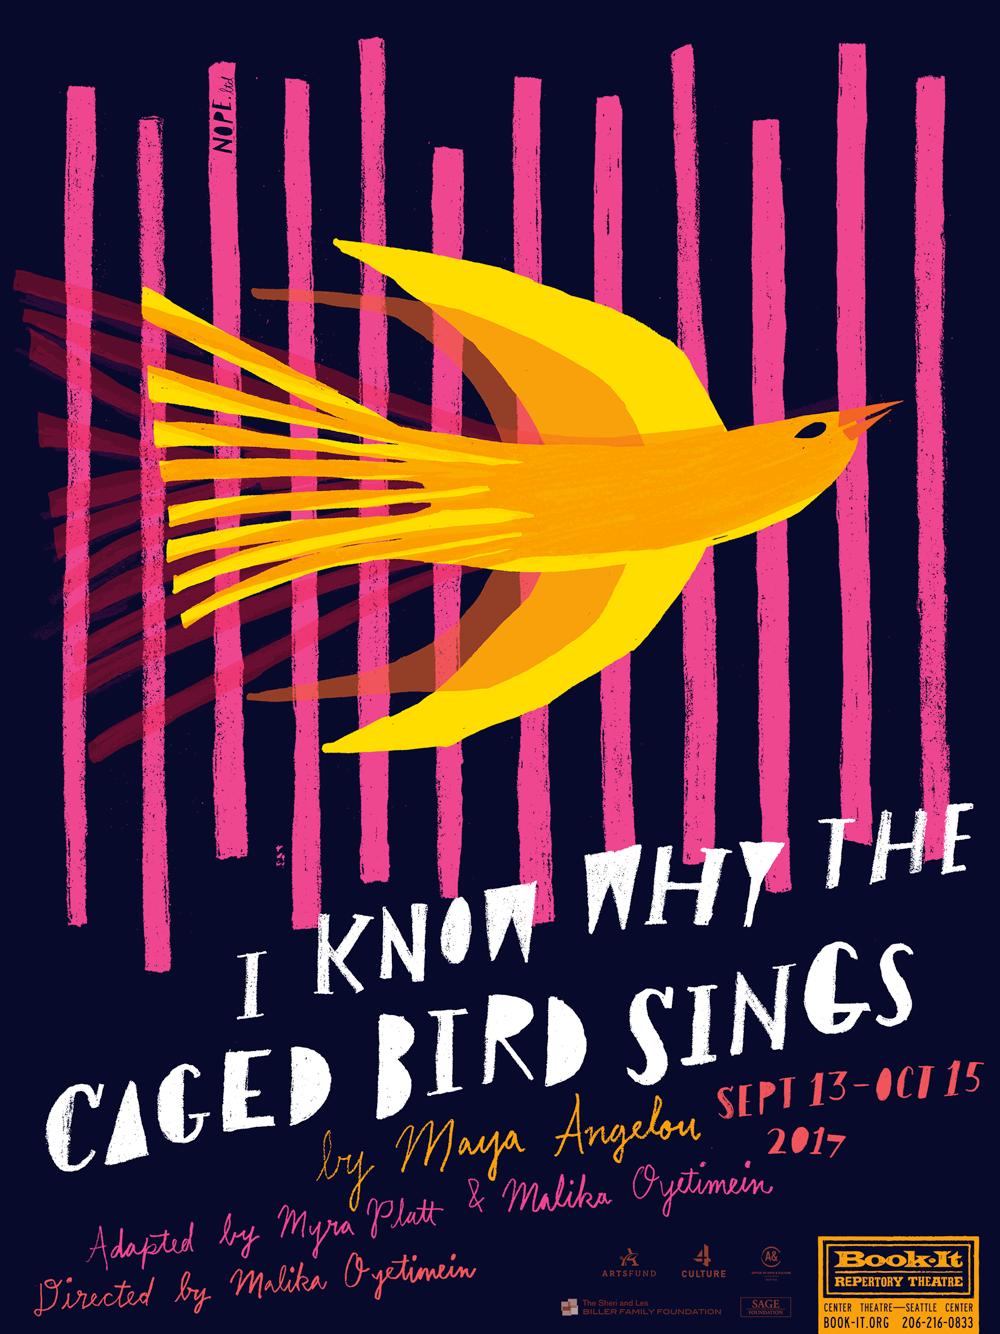 Caged-Bird-1000